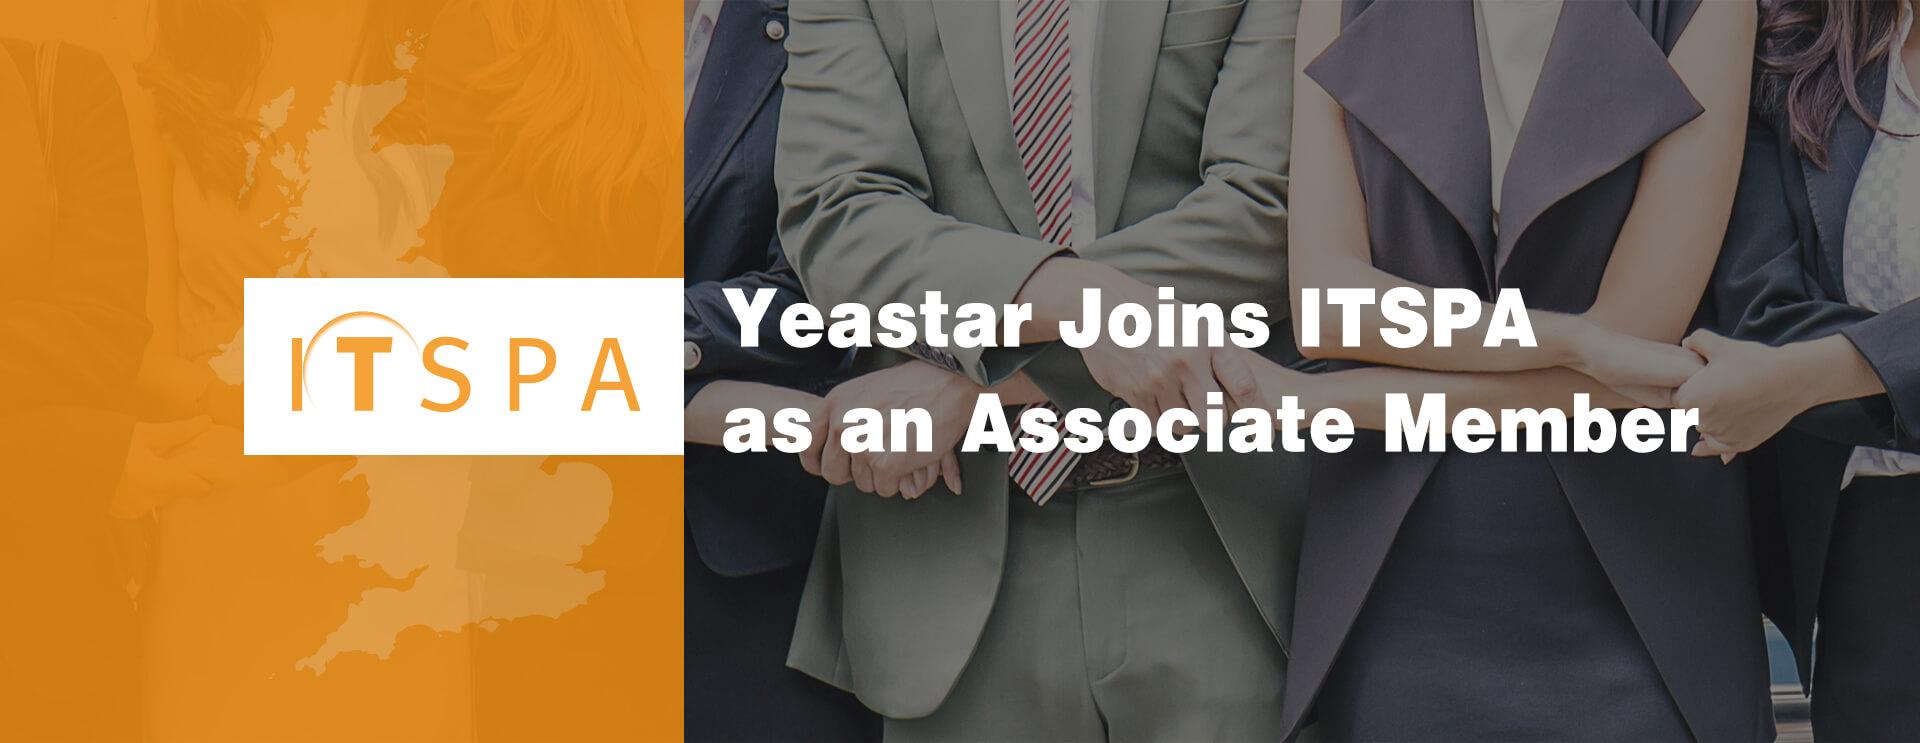 Yeastar Joins ITSPA Banner